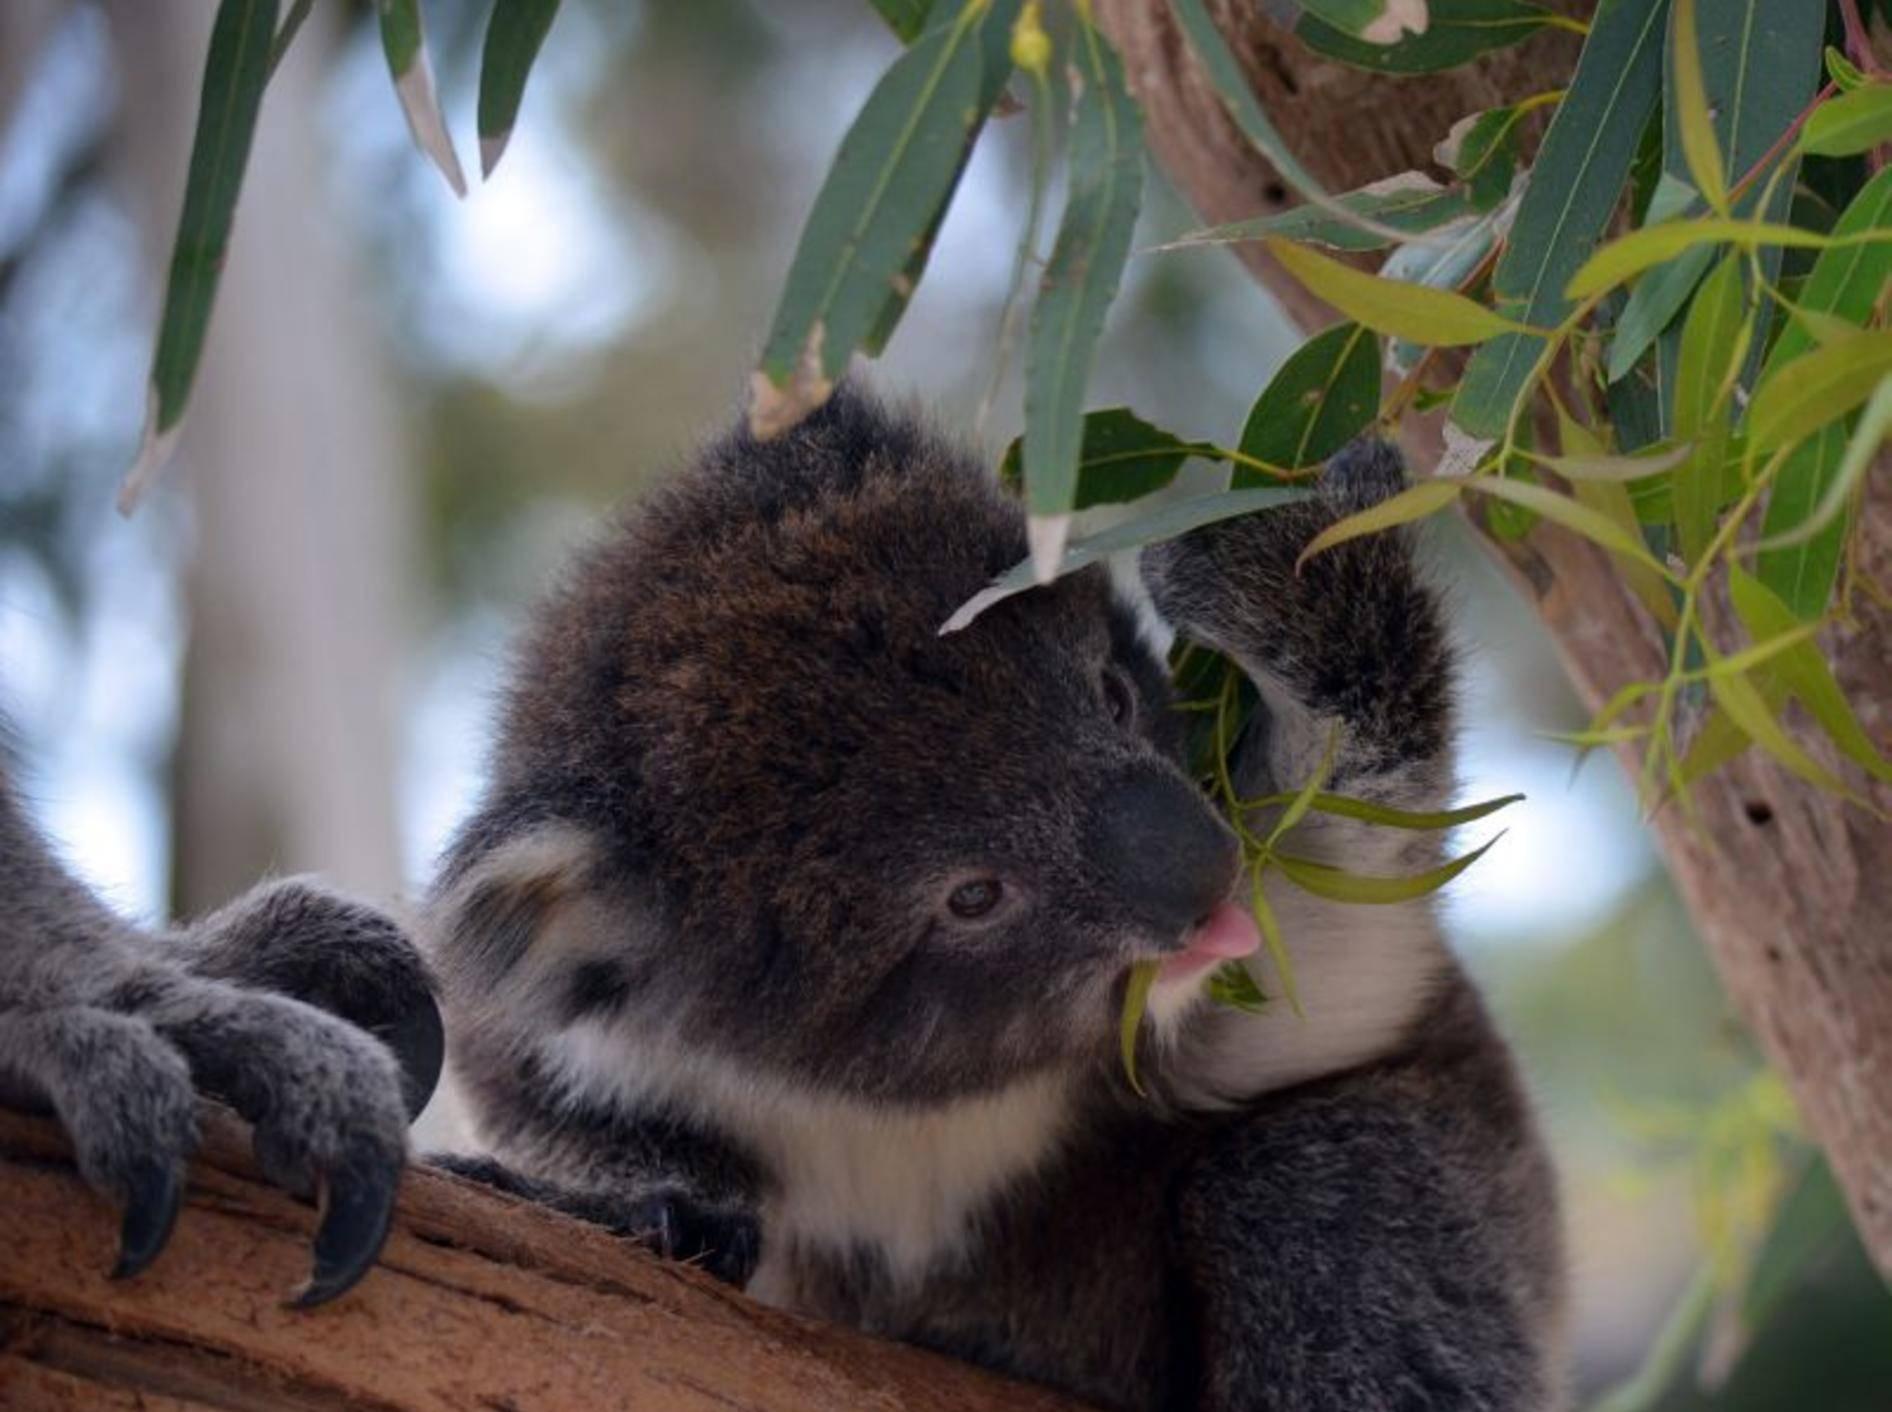 Man muss den Koala einfach mögen, weil er so süß beim Essen aussieht — Bild: Shutterstock / Susan Flashman